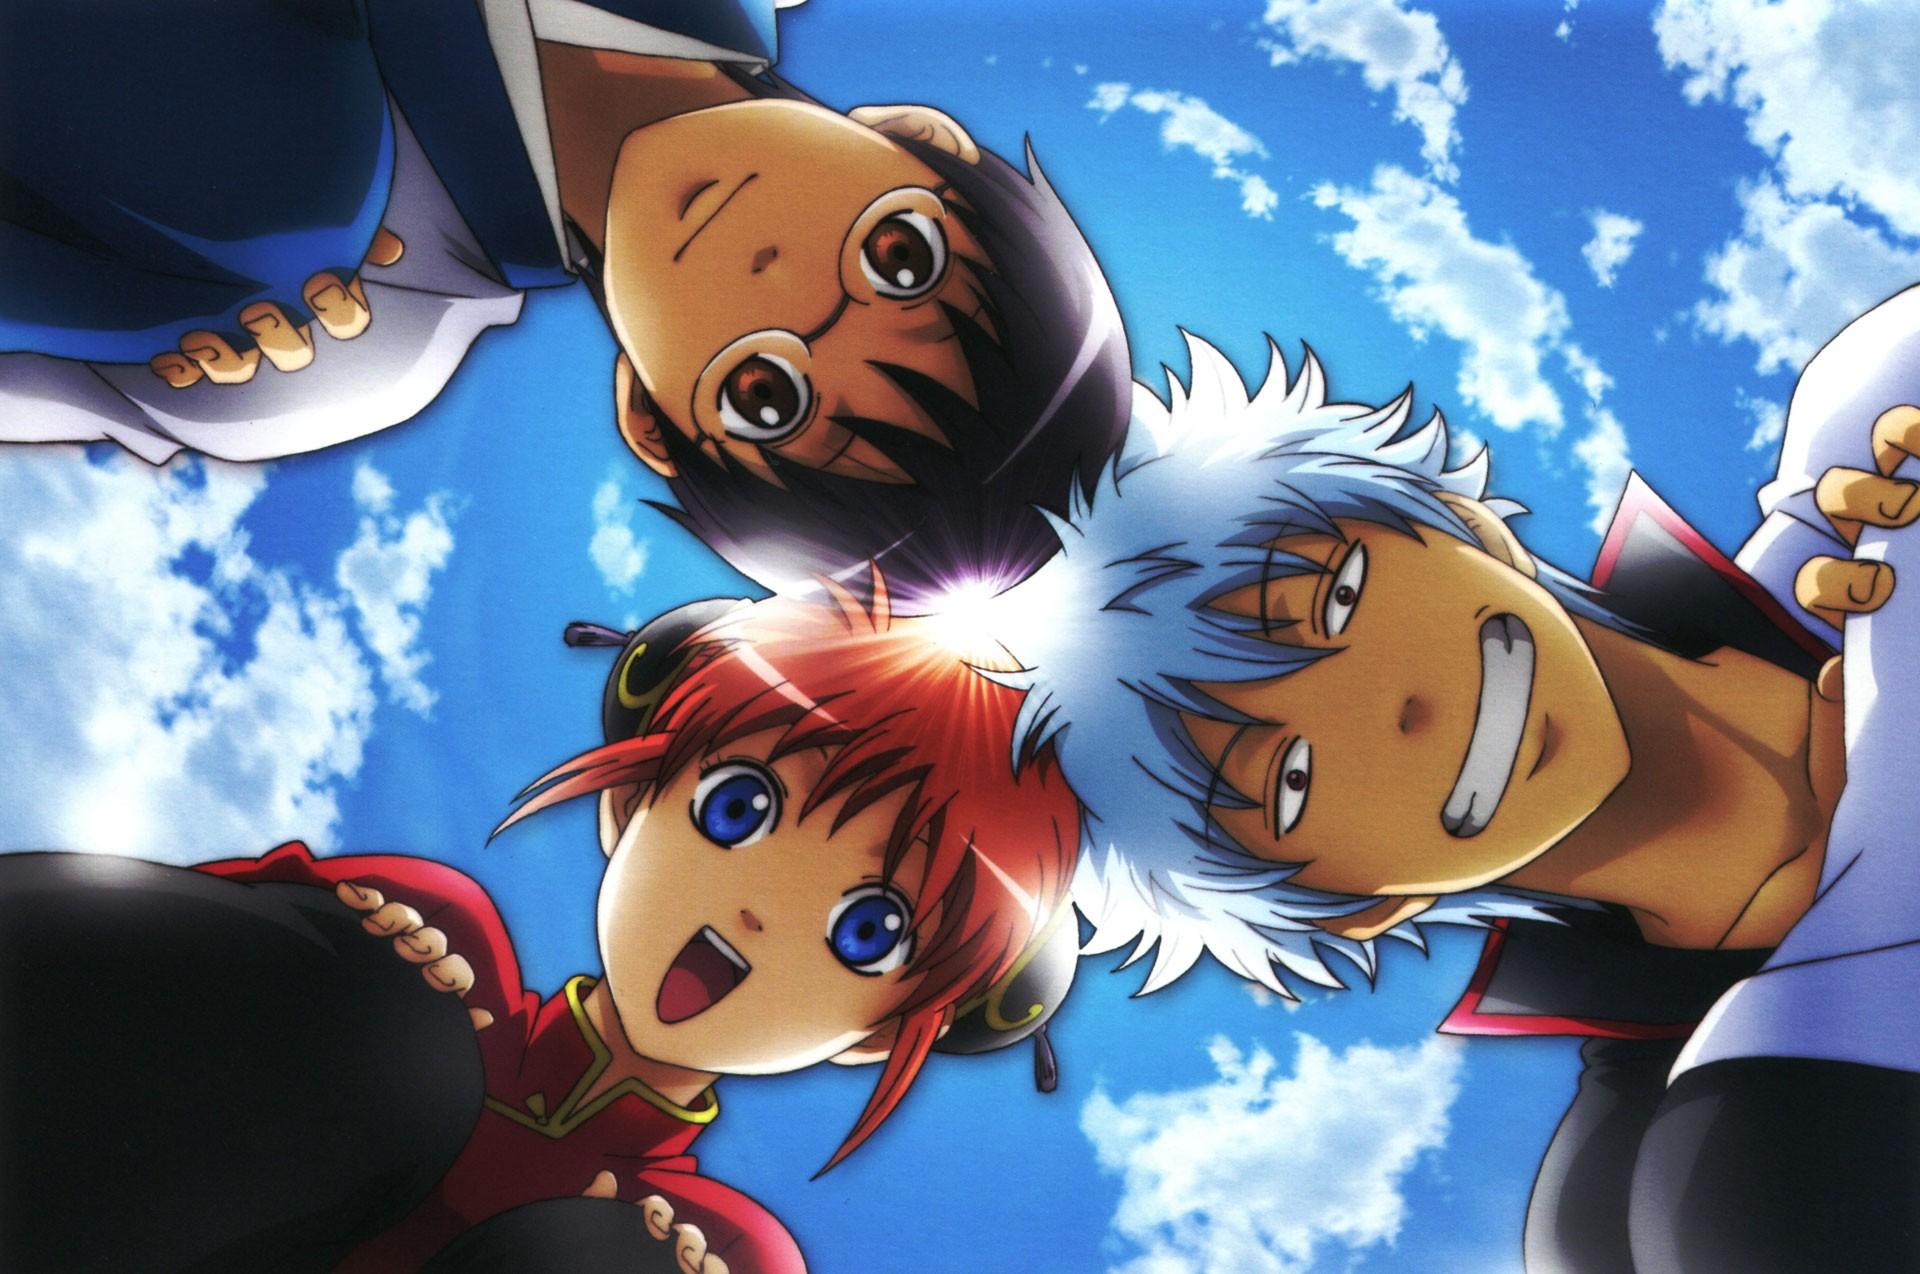 [ARTICLE][TOP 5] Les Mangas/Animes les plus drôles 49444_gintama